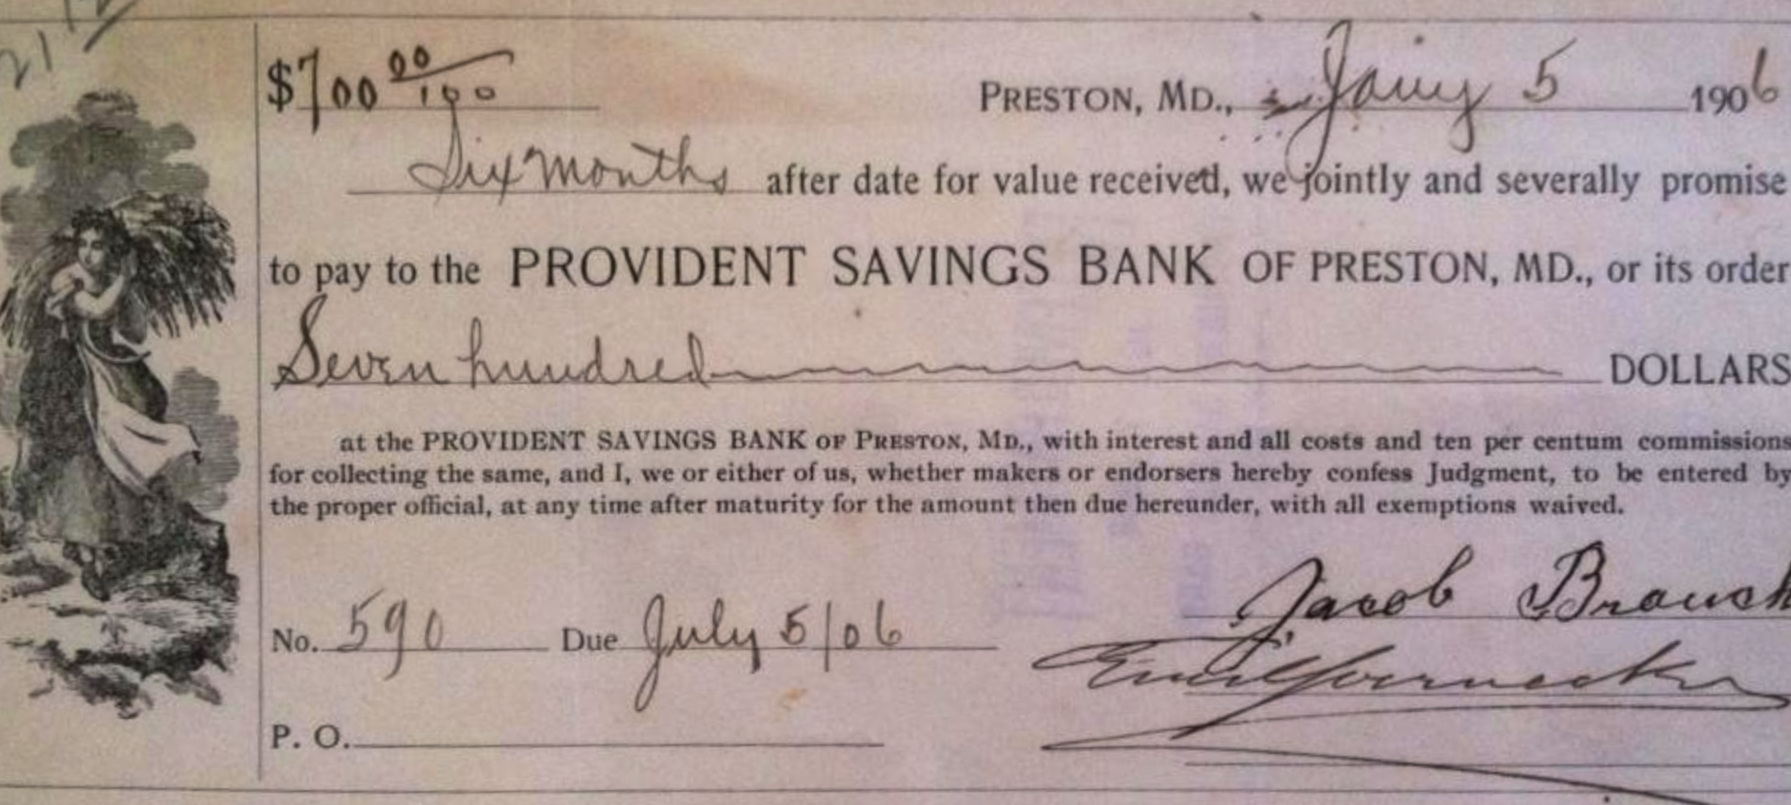 Provident Savings Bank